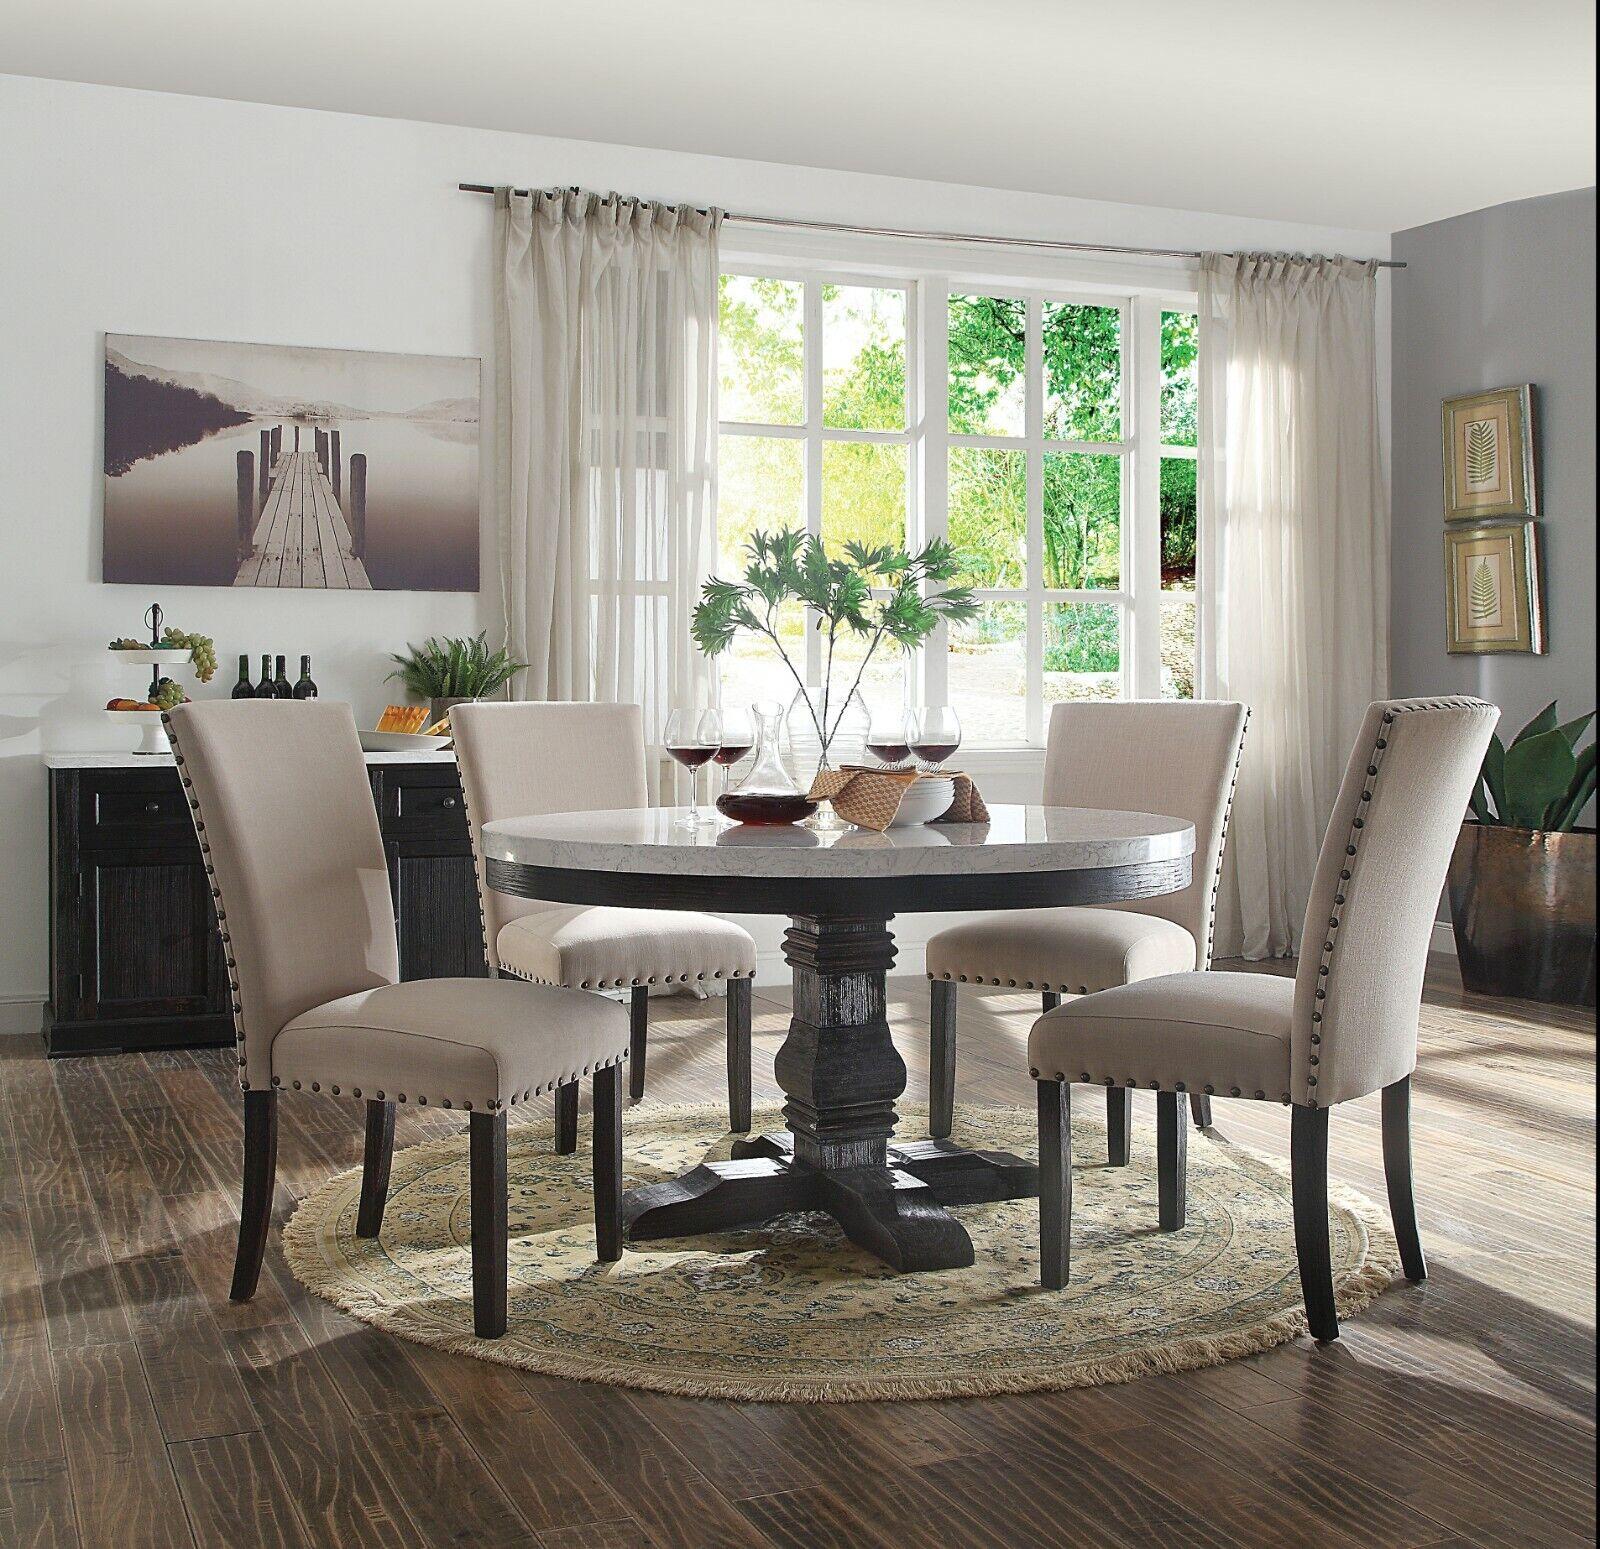 Acme Furniture Nolan Round Pedestal 5 Piece Marble Dining Room Set For Sale Online Ebay